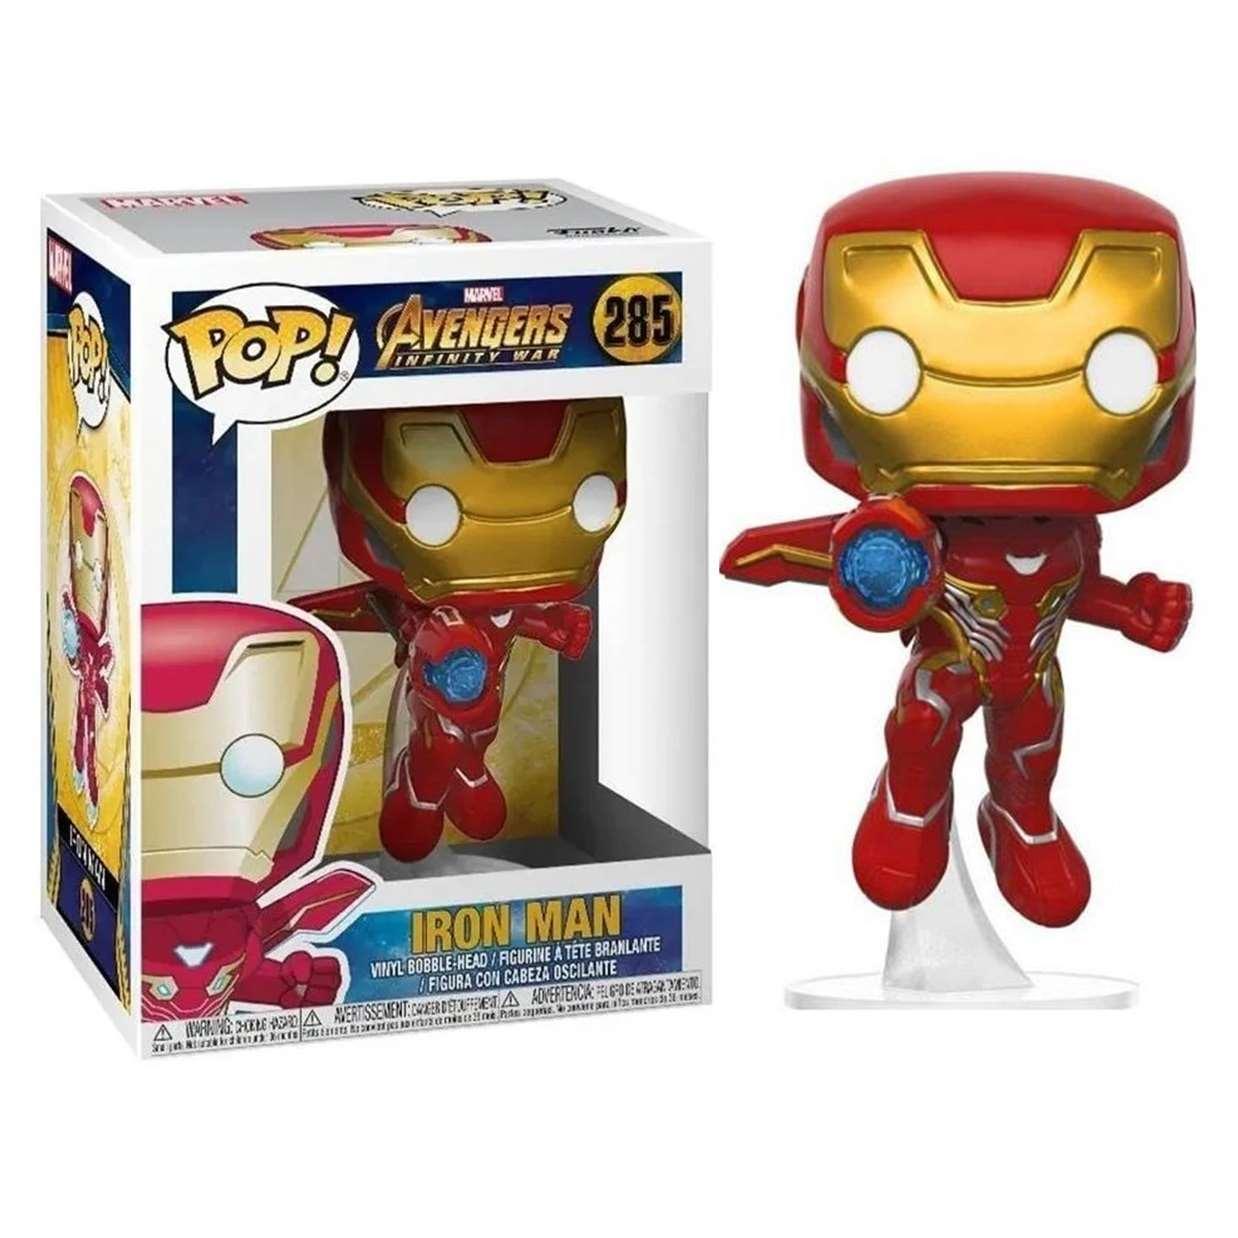 Iron Man #285 Figura Avengers Infinity War Funko Pop!